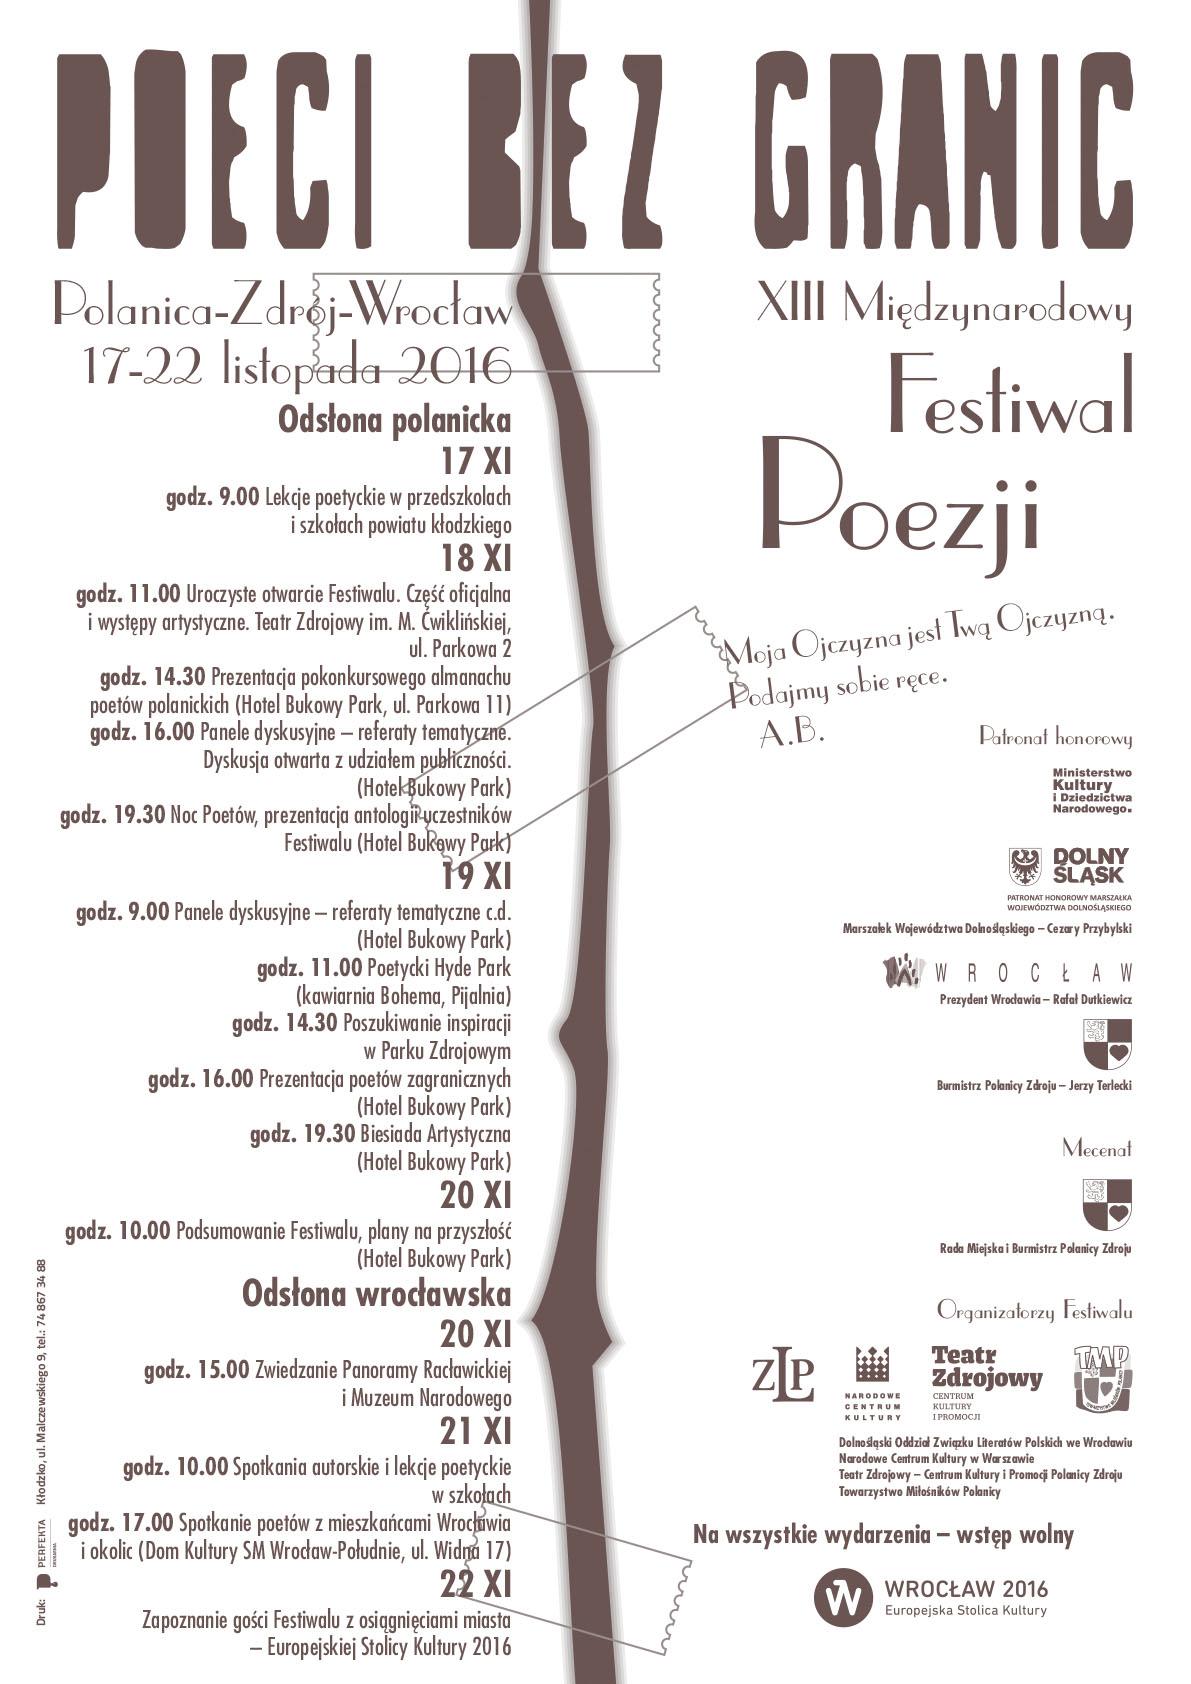 mck poloanica poeci bez granic 2016 plakat A2